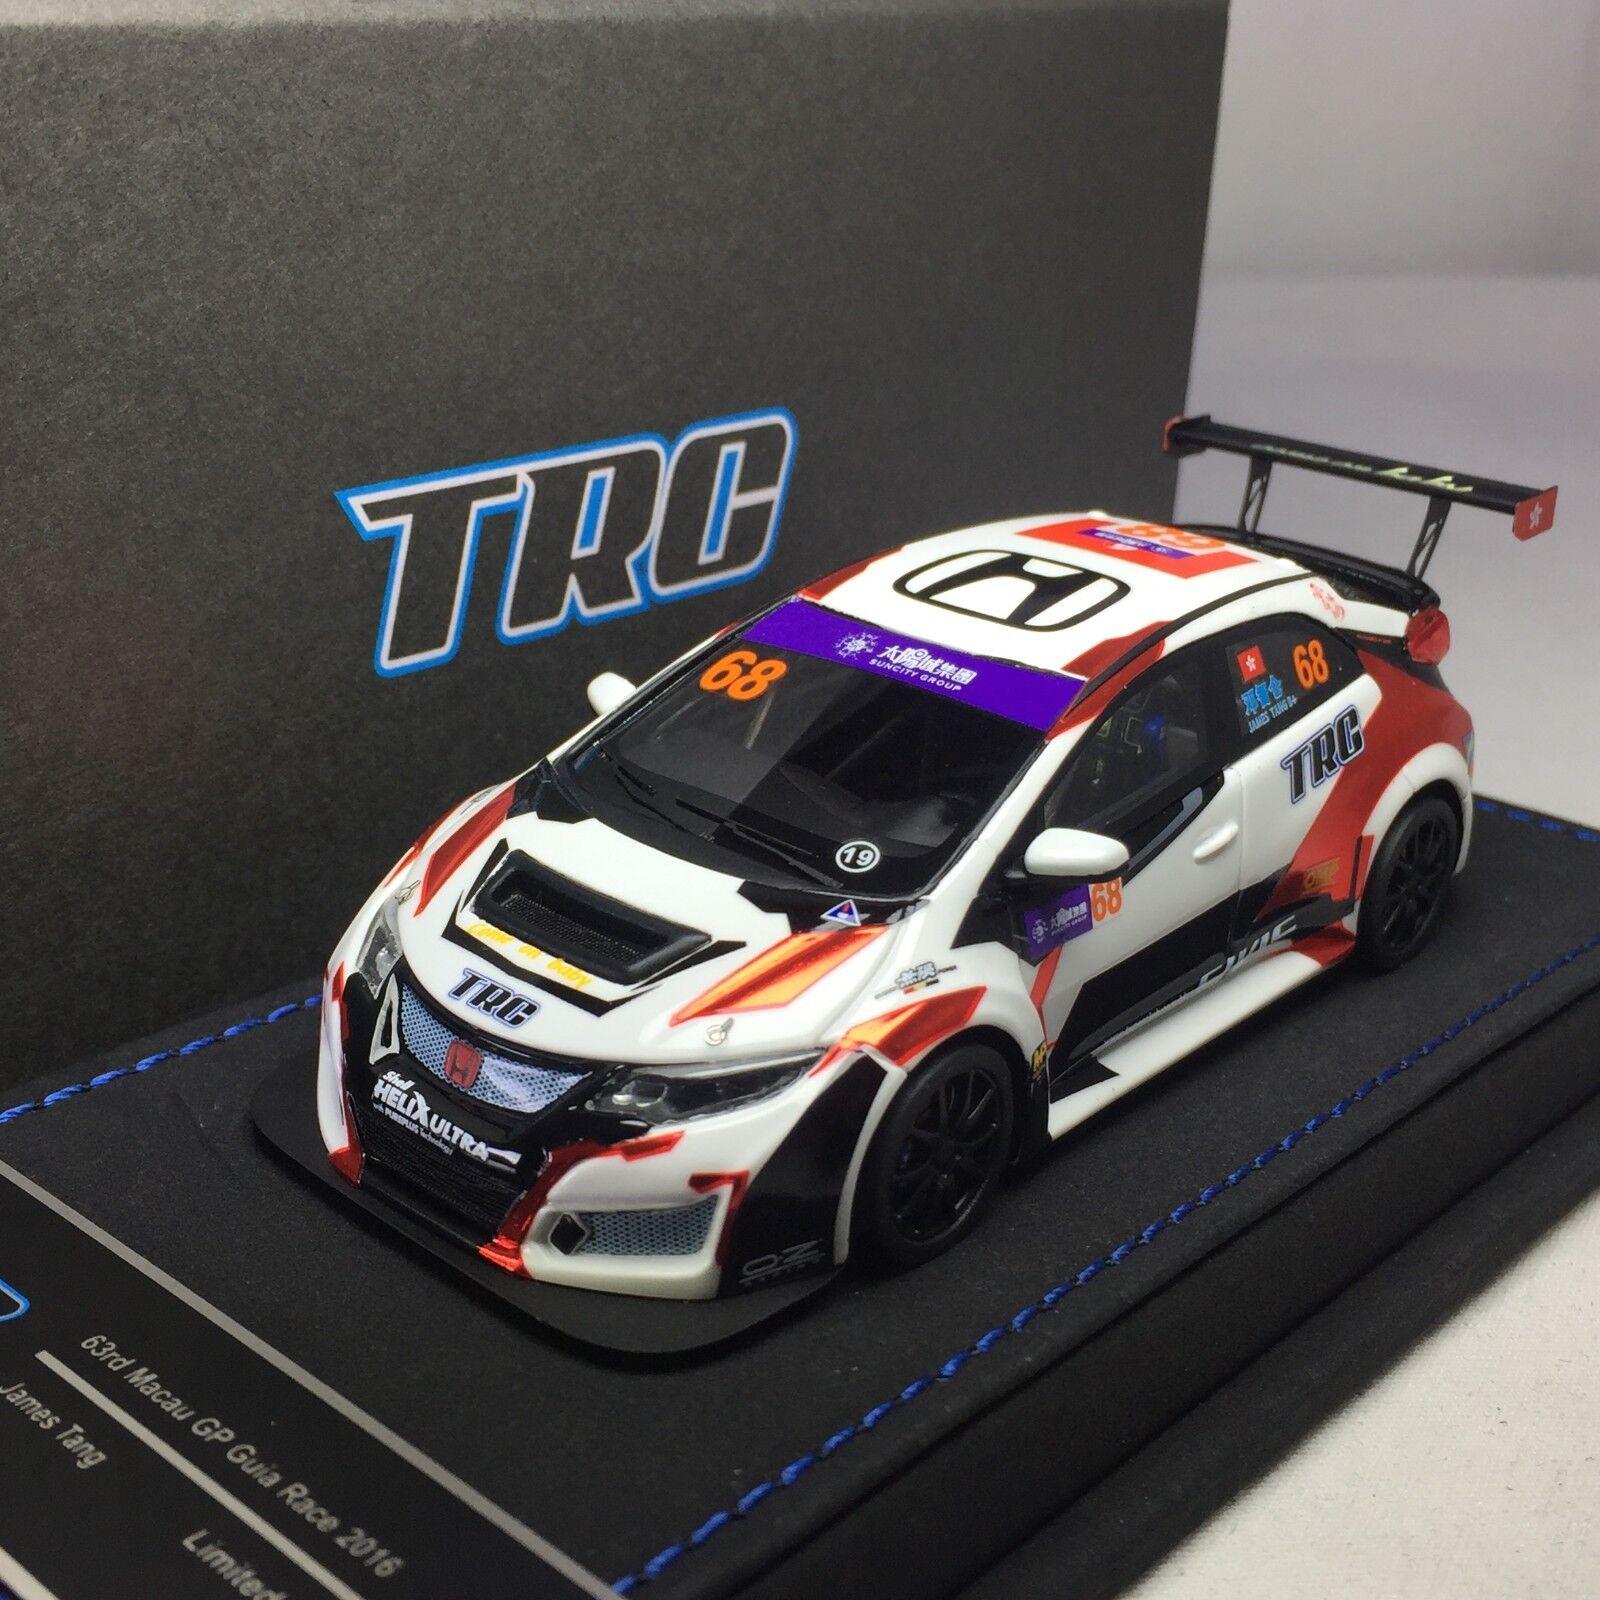 1/43 Peako TRC Honda Civic FK2 Coche De Carreras Tcr Wtcc Macau Grand Prix 2018